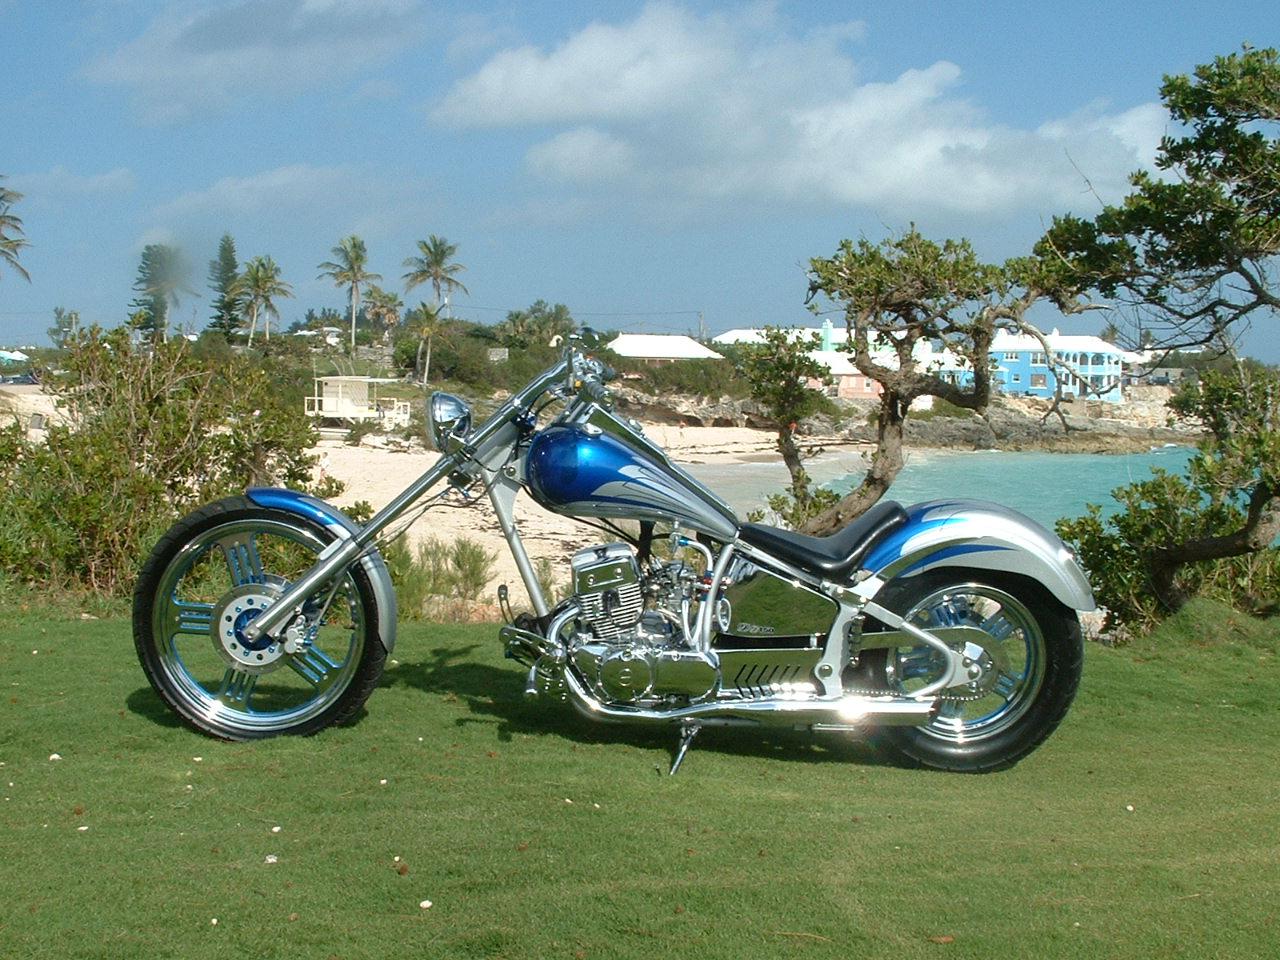 Imagenes de motos choperas